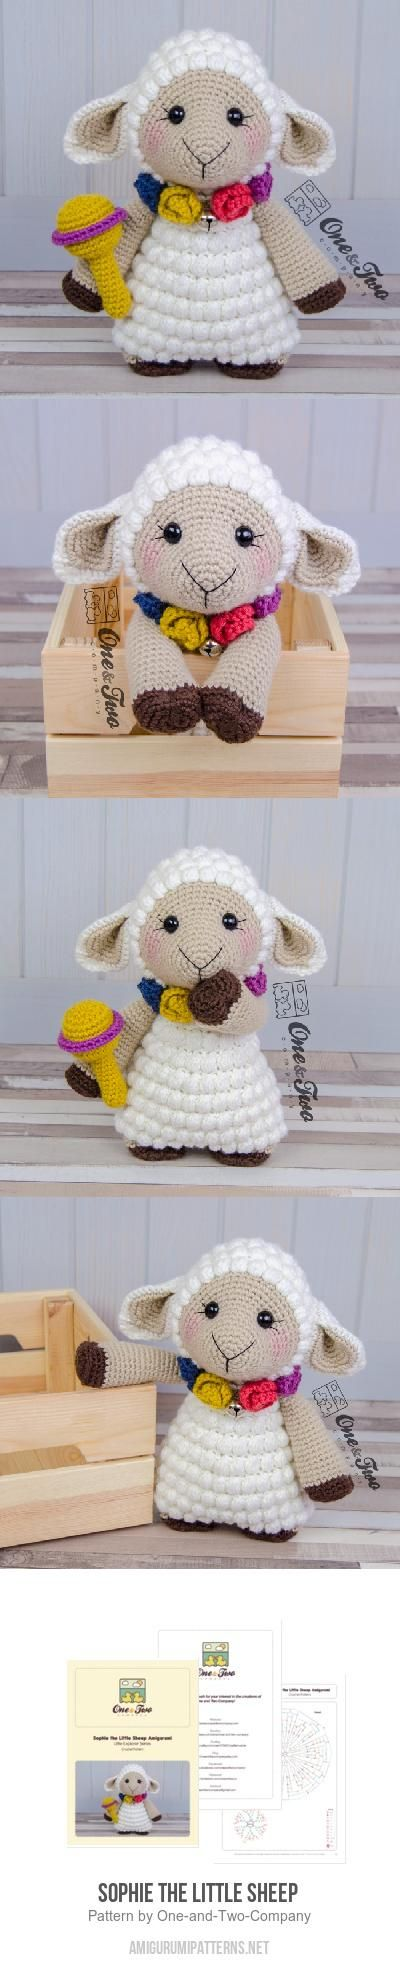 Sophie the Little Sheep  amigurumi pattern